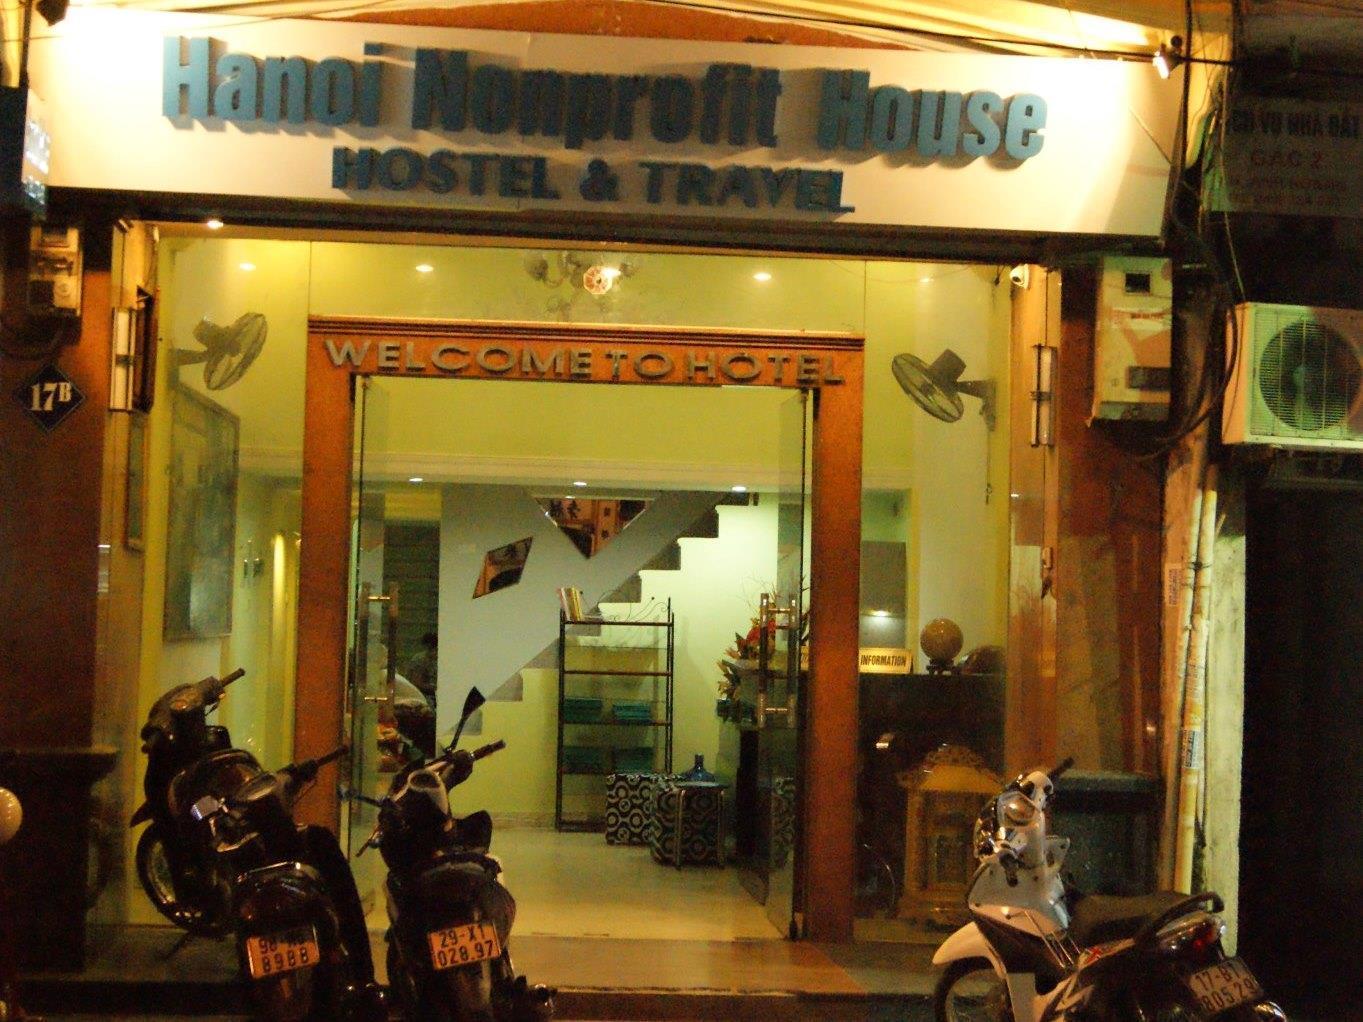 Hanoi Nonprofit House